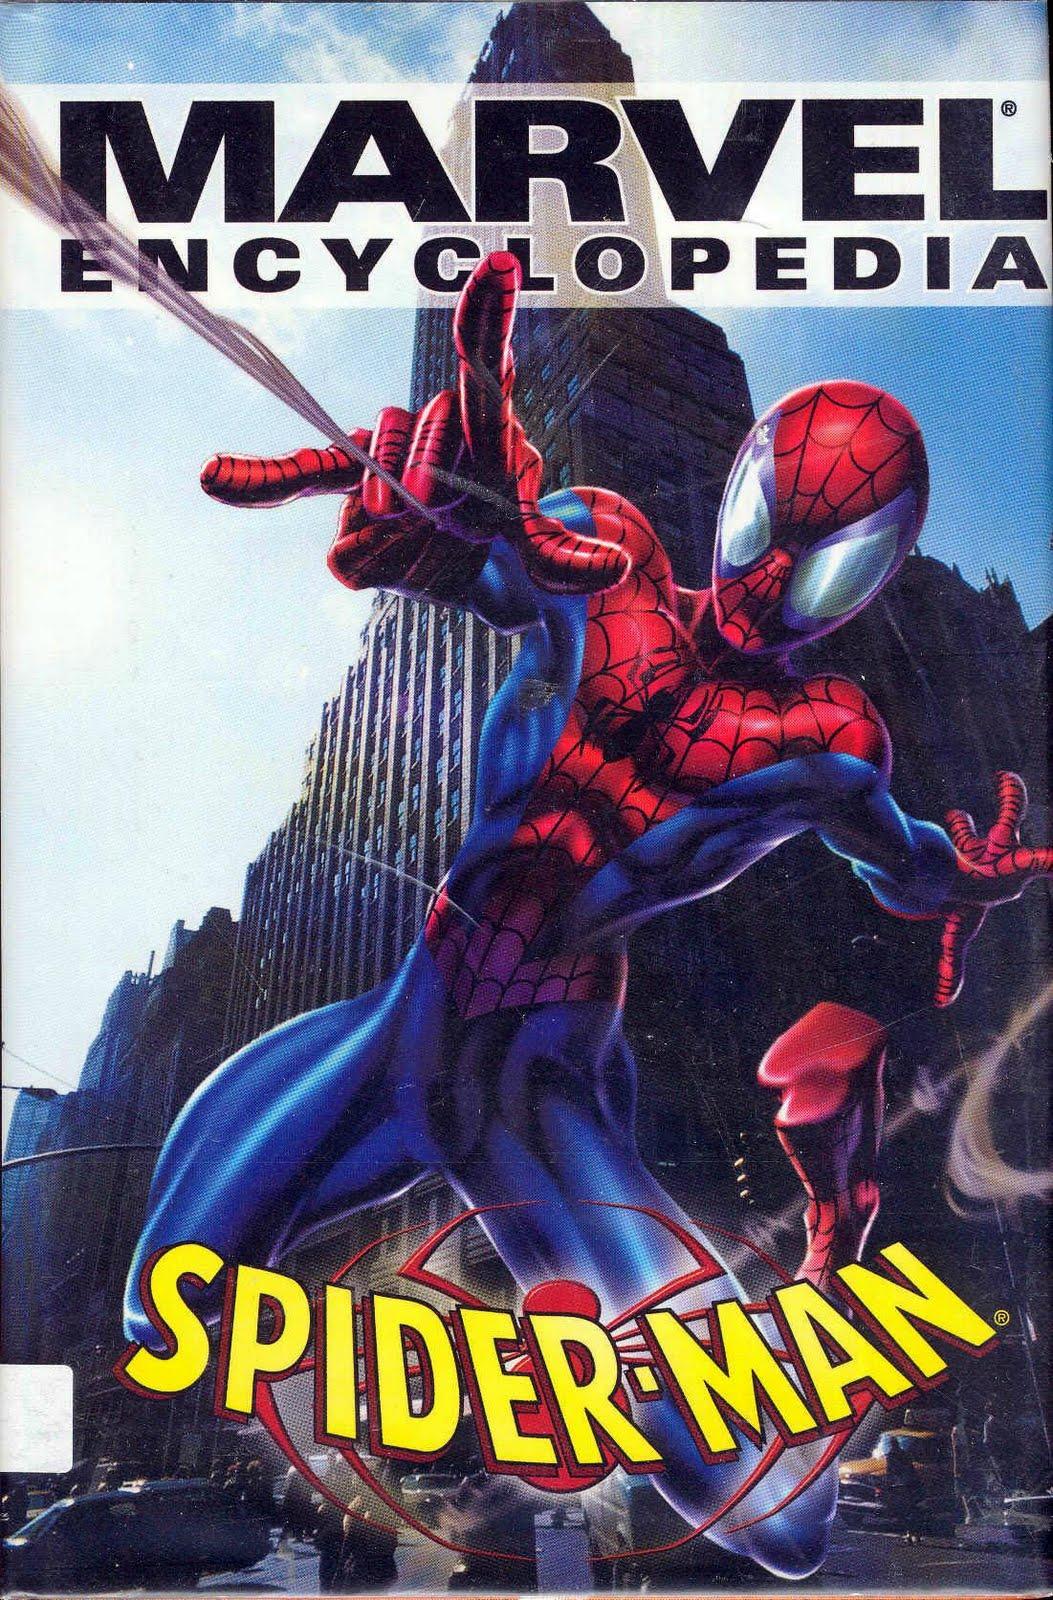 Marvel encyclopedia vol 1 spider man marvel database wikia - Marvel spiderman comics pdf ...